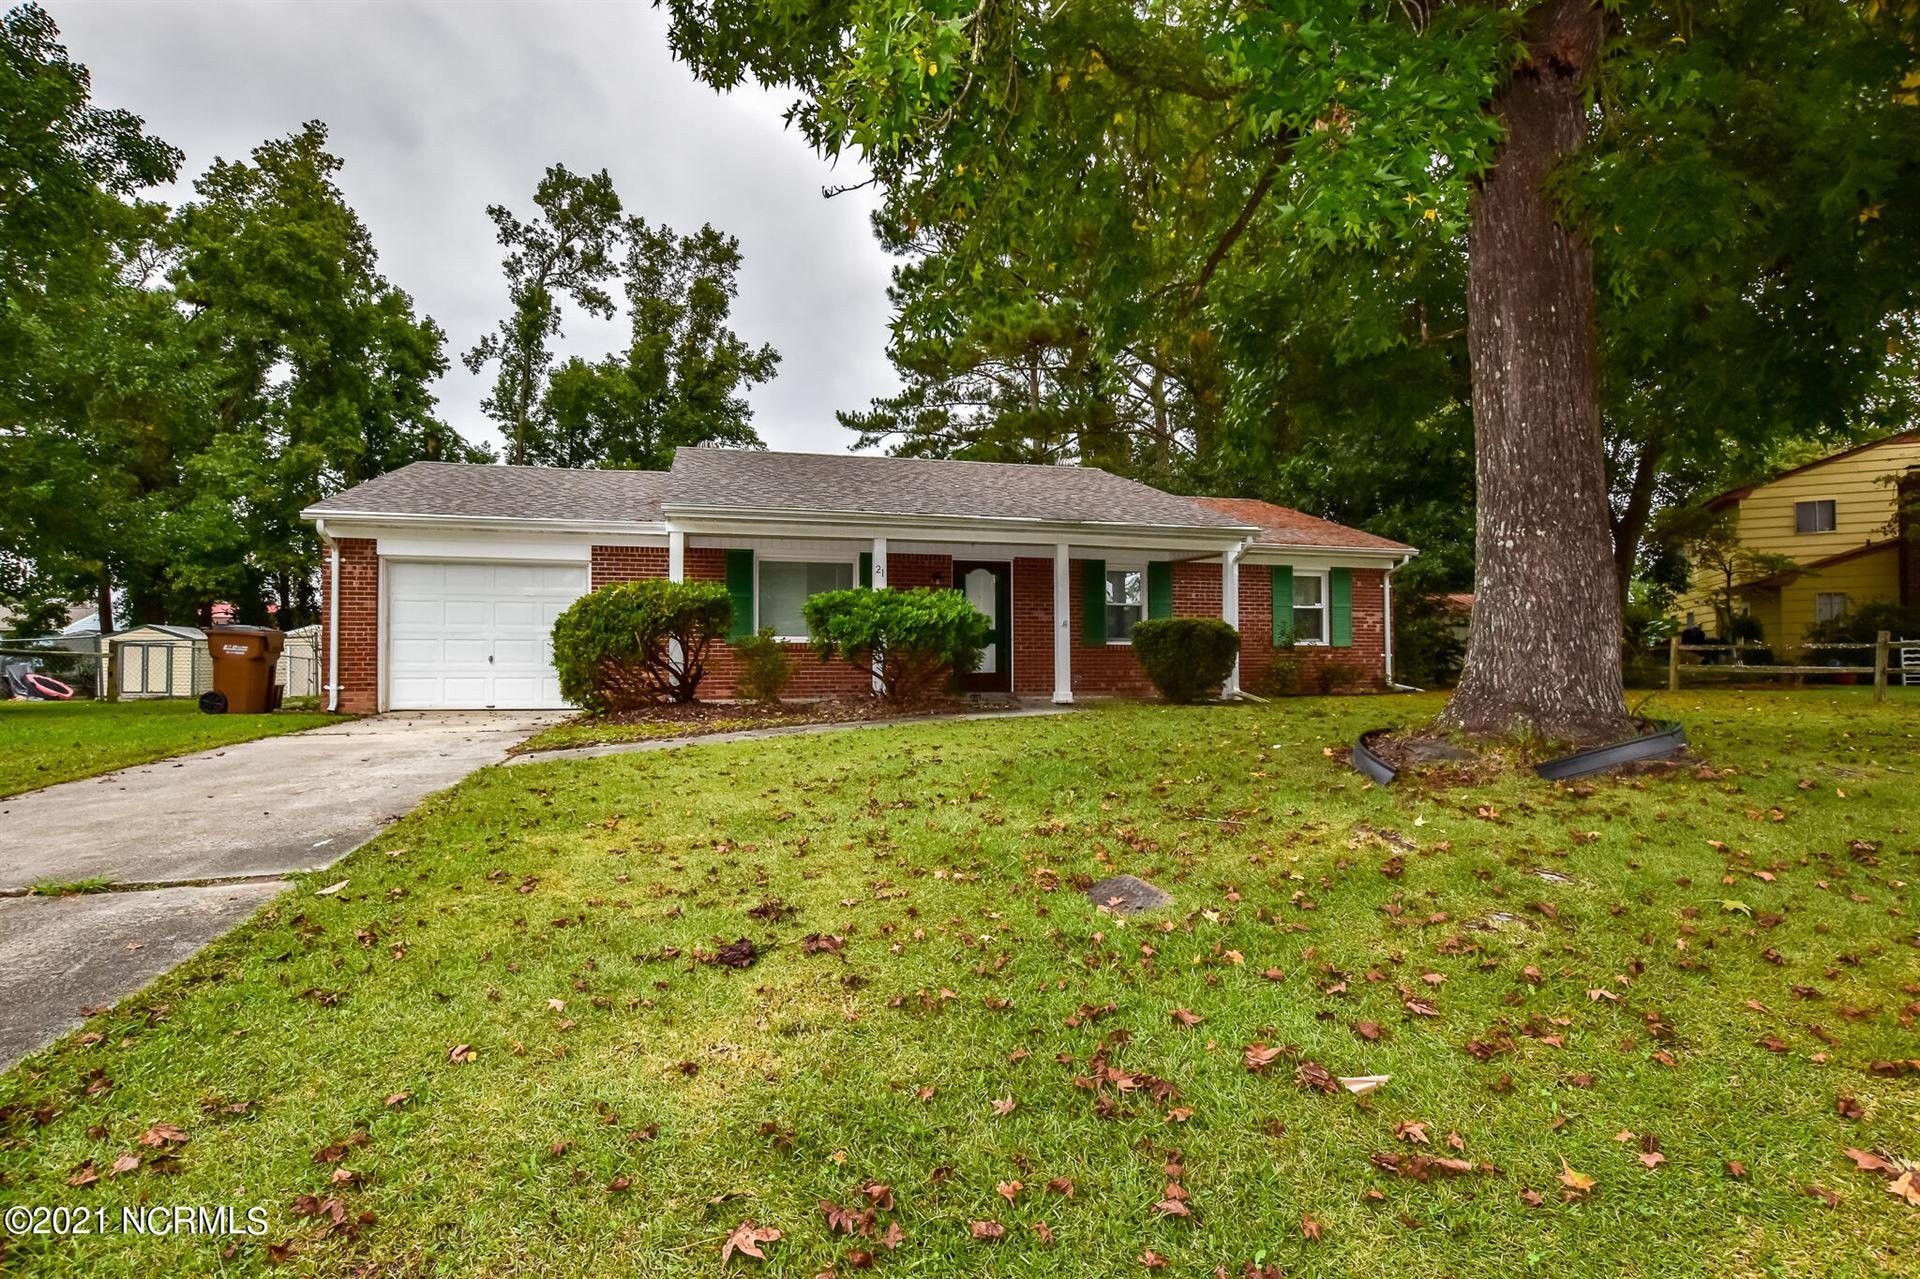 Photo of 21 Walnut Drive, Jacksonville, NC 28546 (MLS # 100295242)